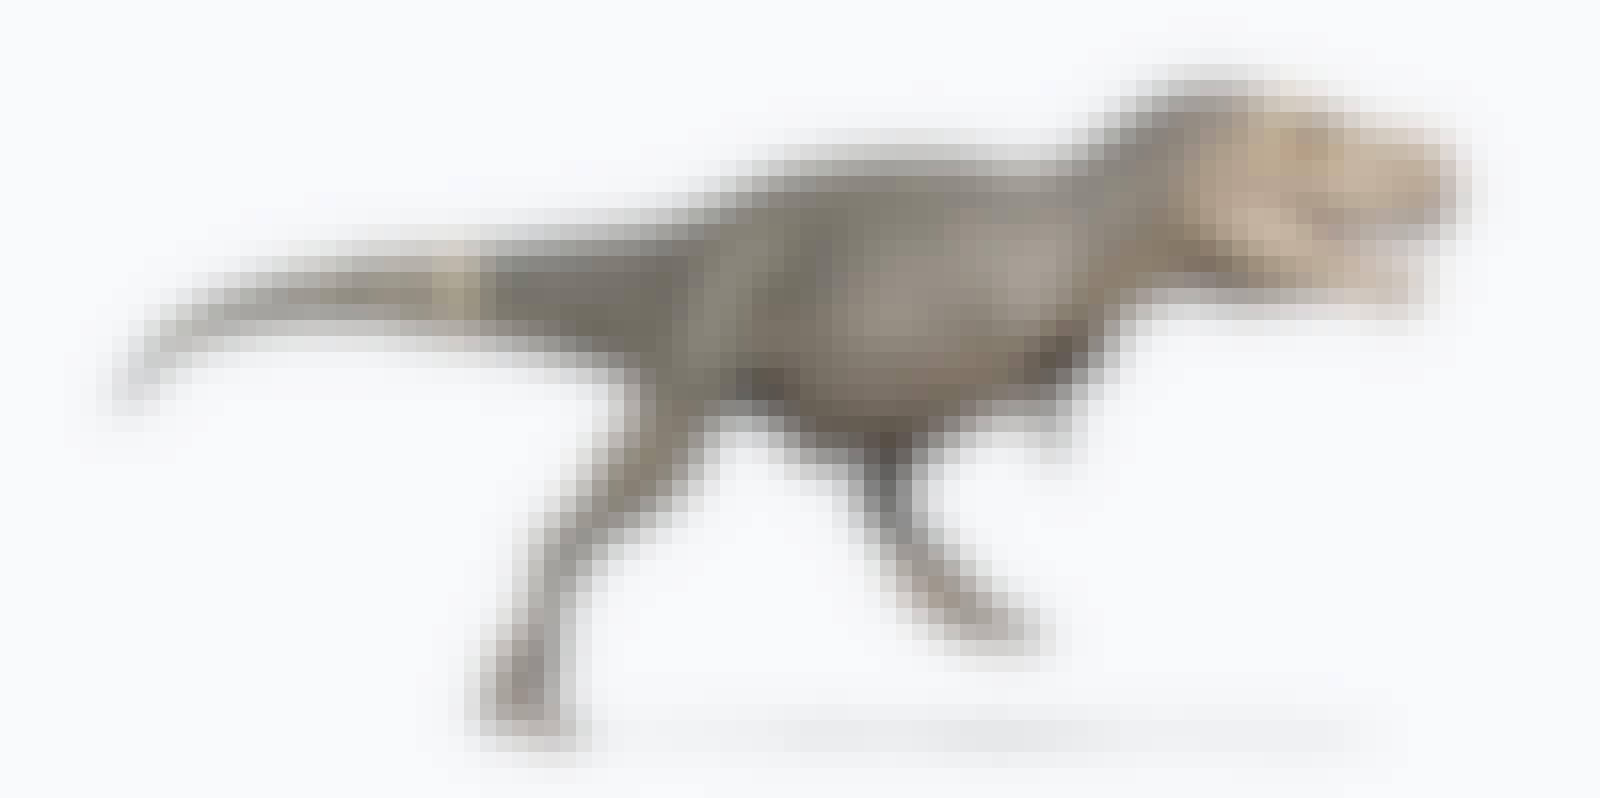 Tyrannosaurus rex løper